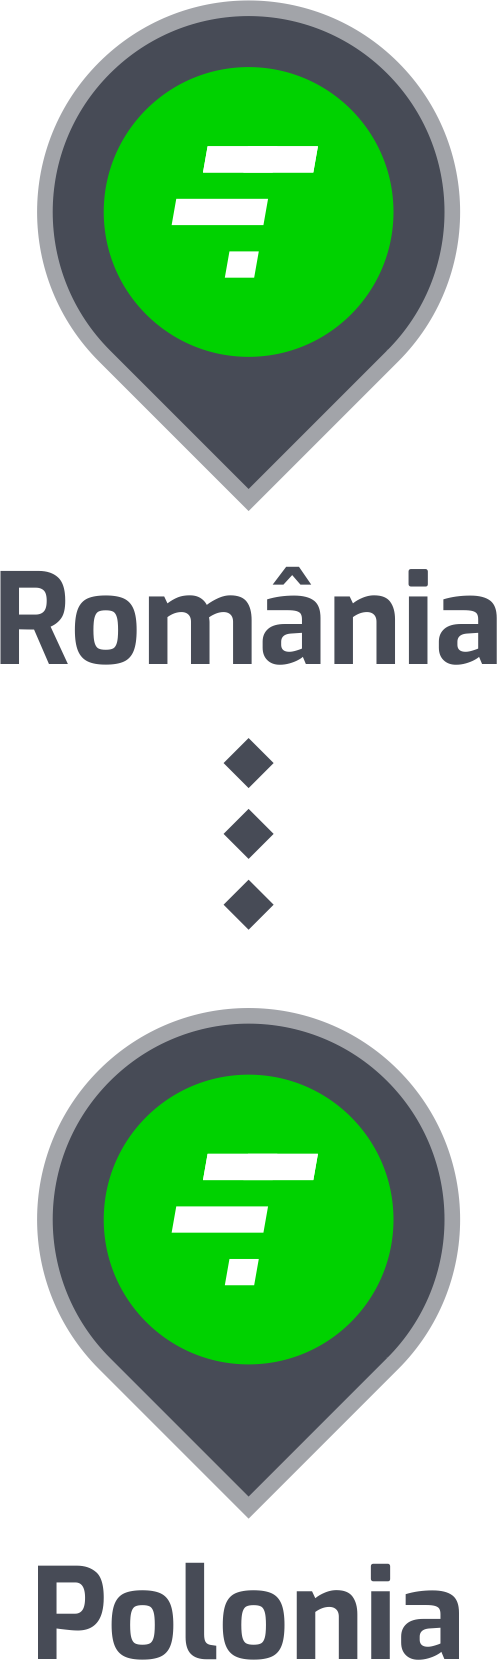 transport international Polonia Romania